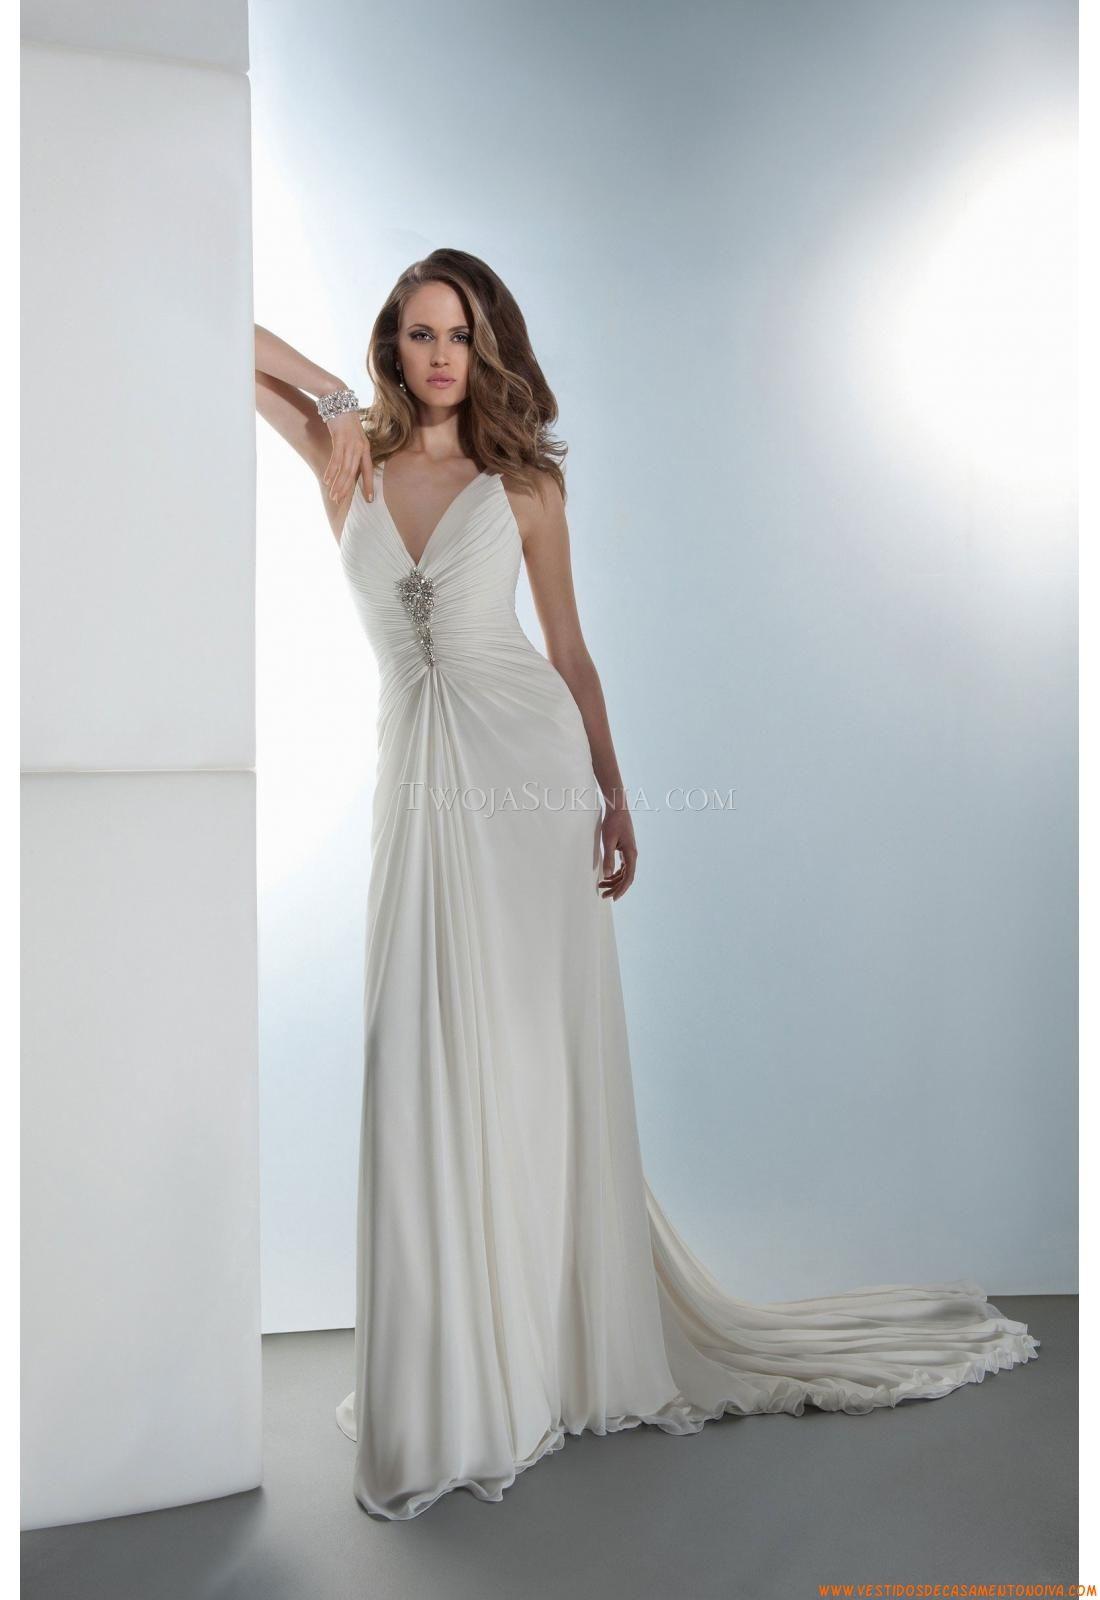 Al aire libre Vestidos de novia 2013 | trajes de novia | Pinterest ...